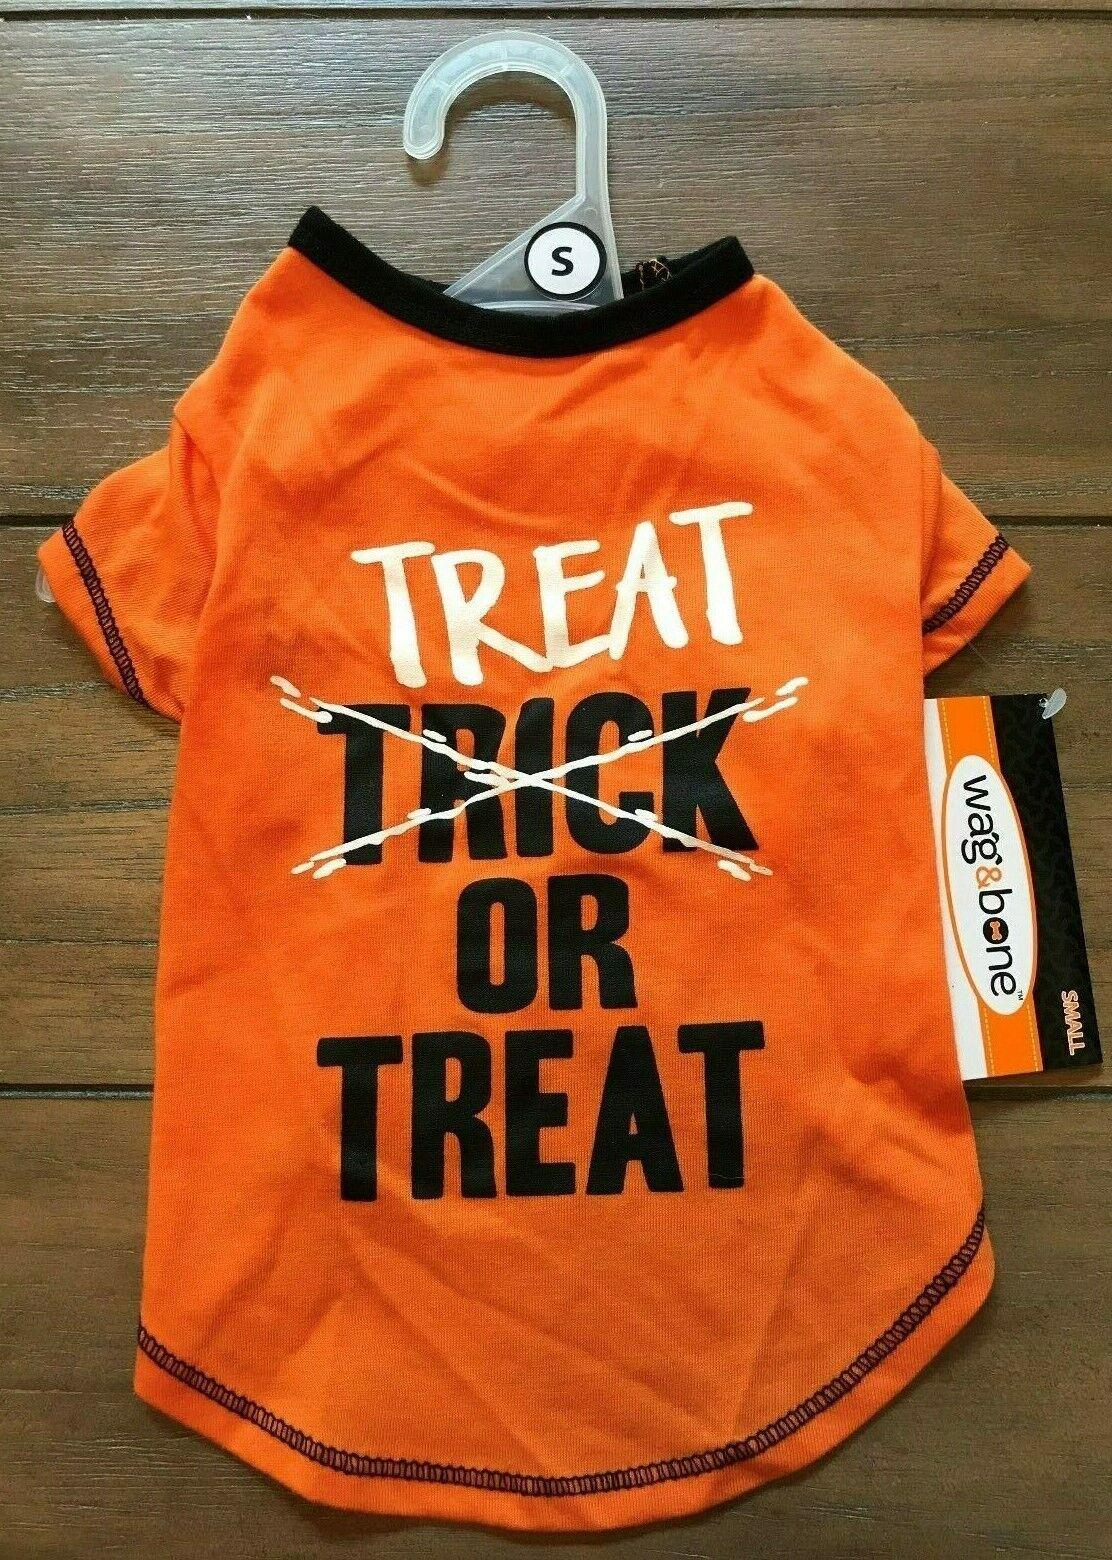 TREAT Or TREAT Dog Shirt - SMALL - Orange/Black - Halloween - Wag Bone - NWT - $10.99